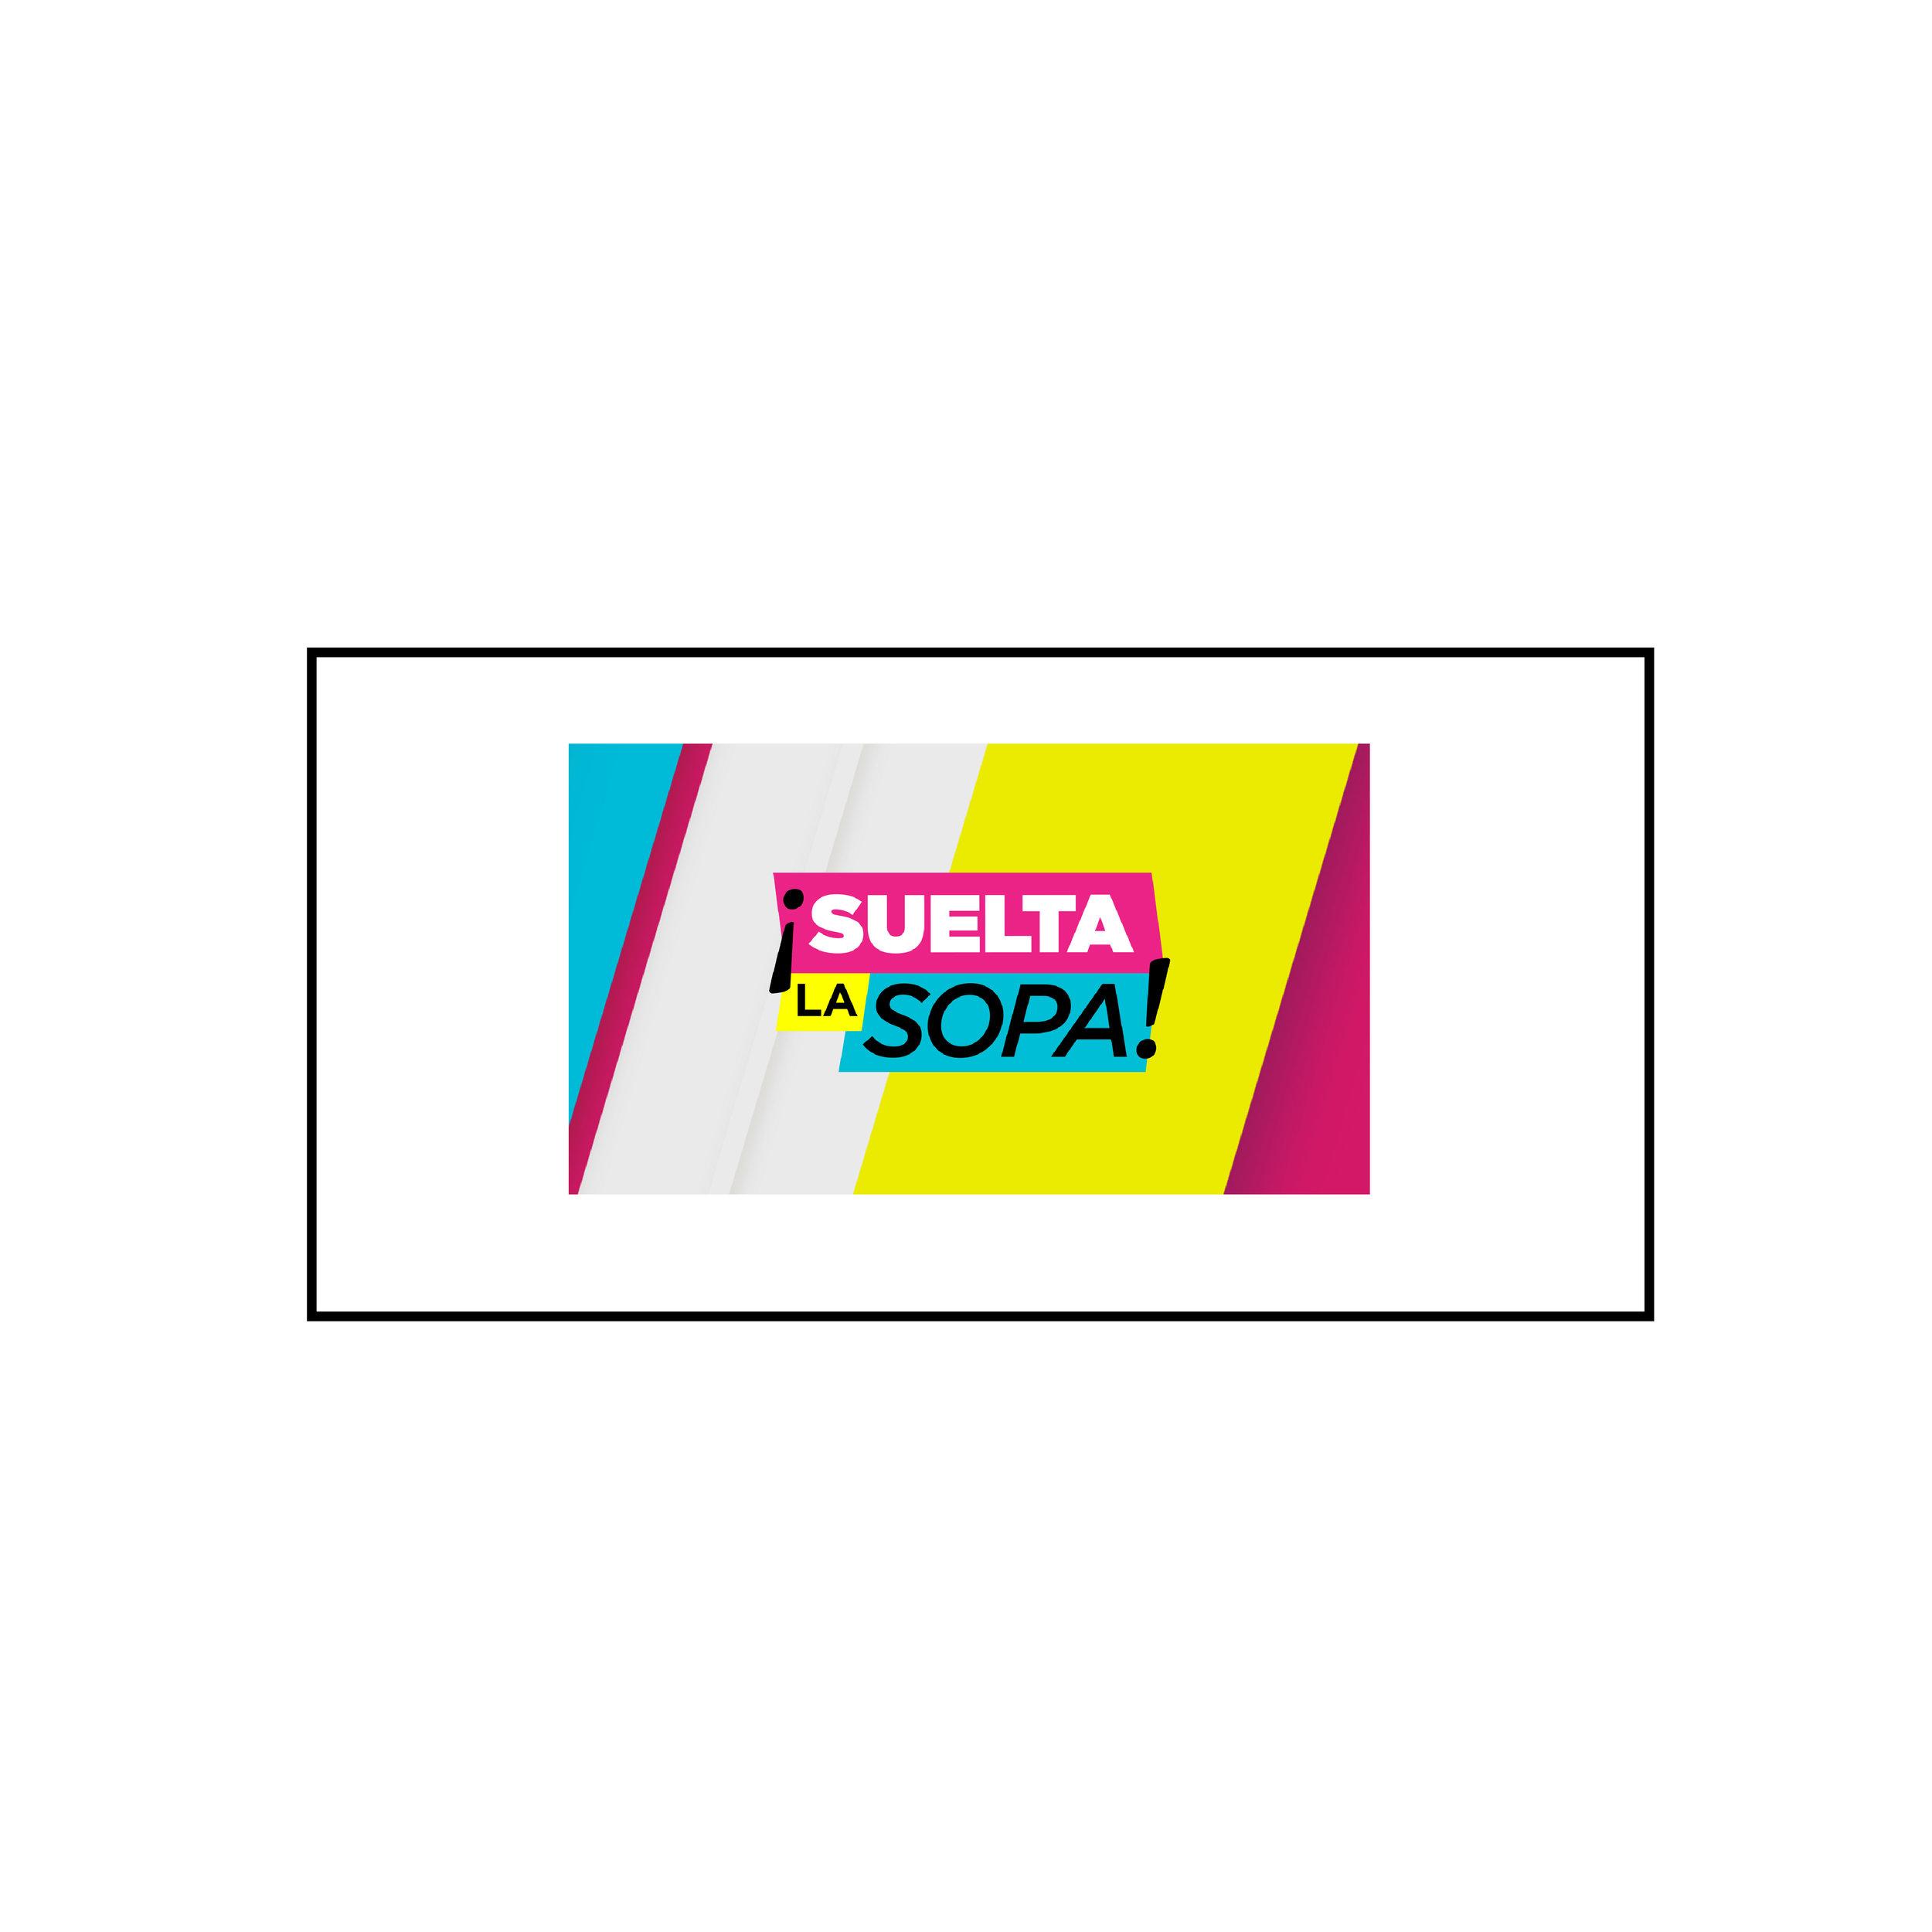 Voices-Suleta La Sopa_SUELTA LA SOPA.jpg